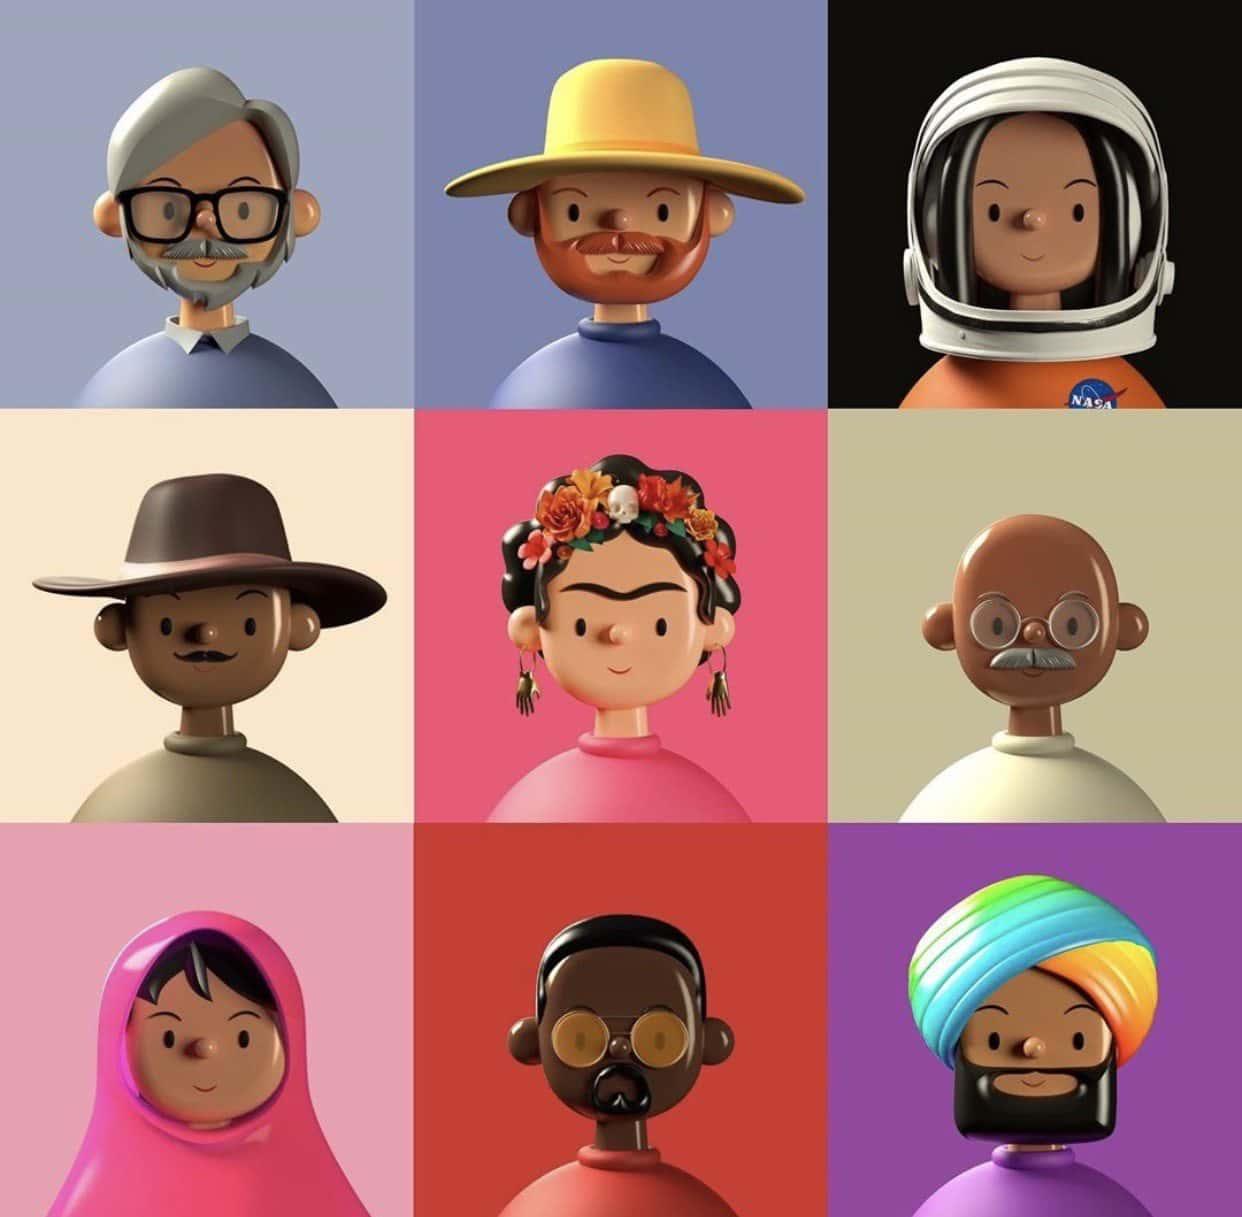 3d avatar designs by Amrit Pal Singh